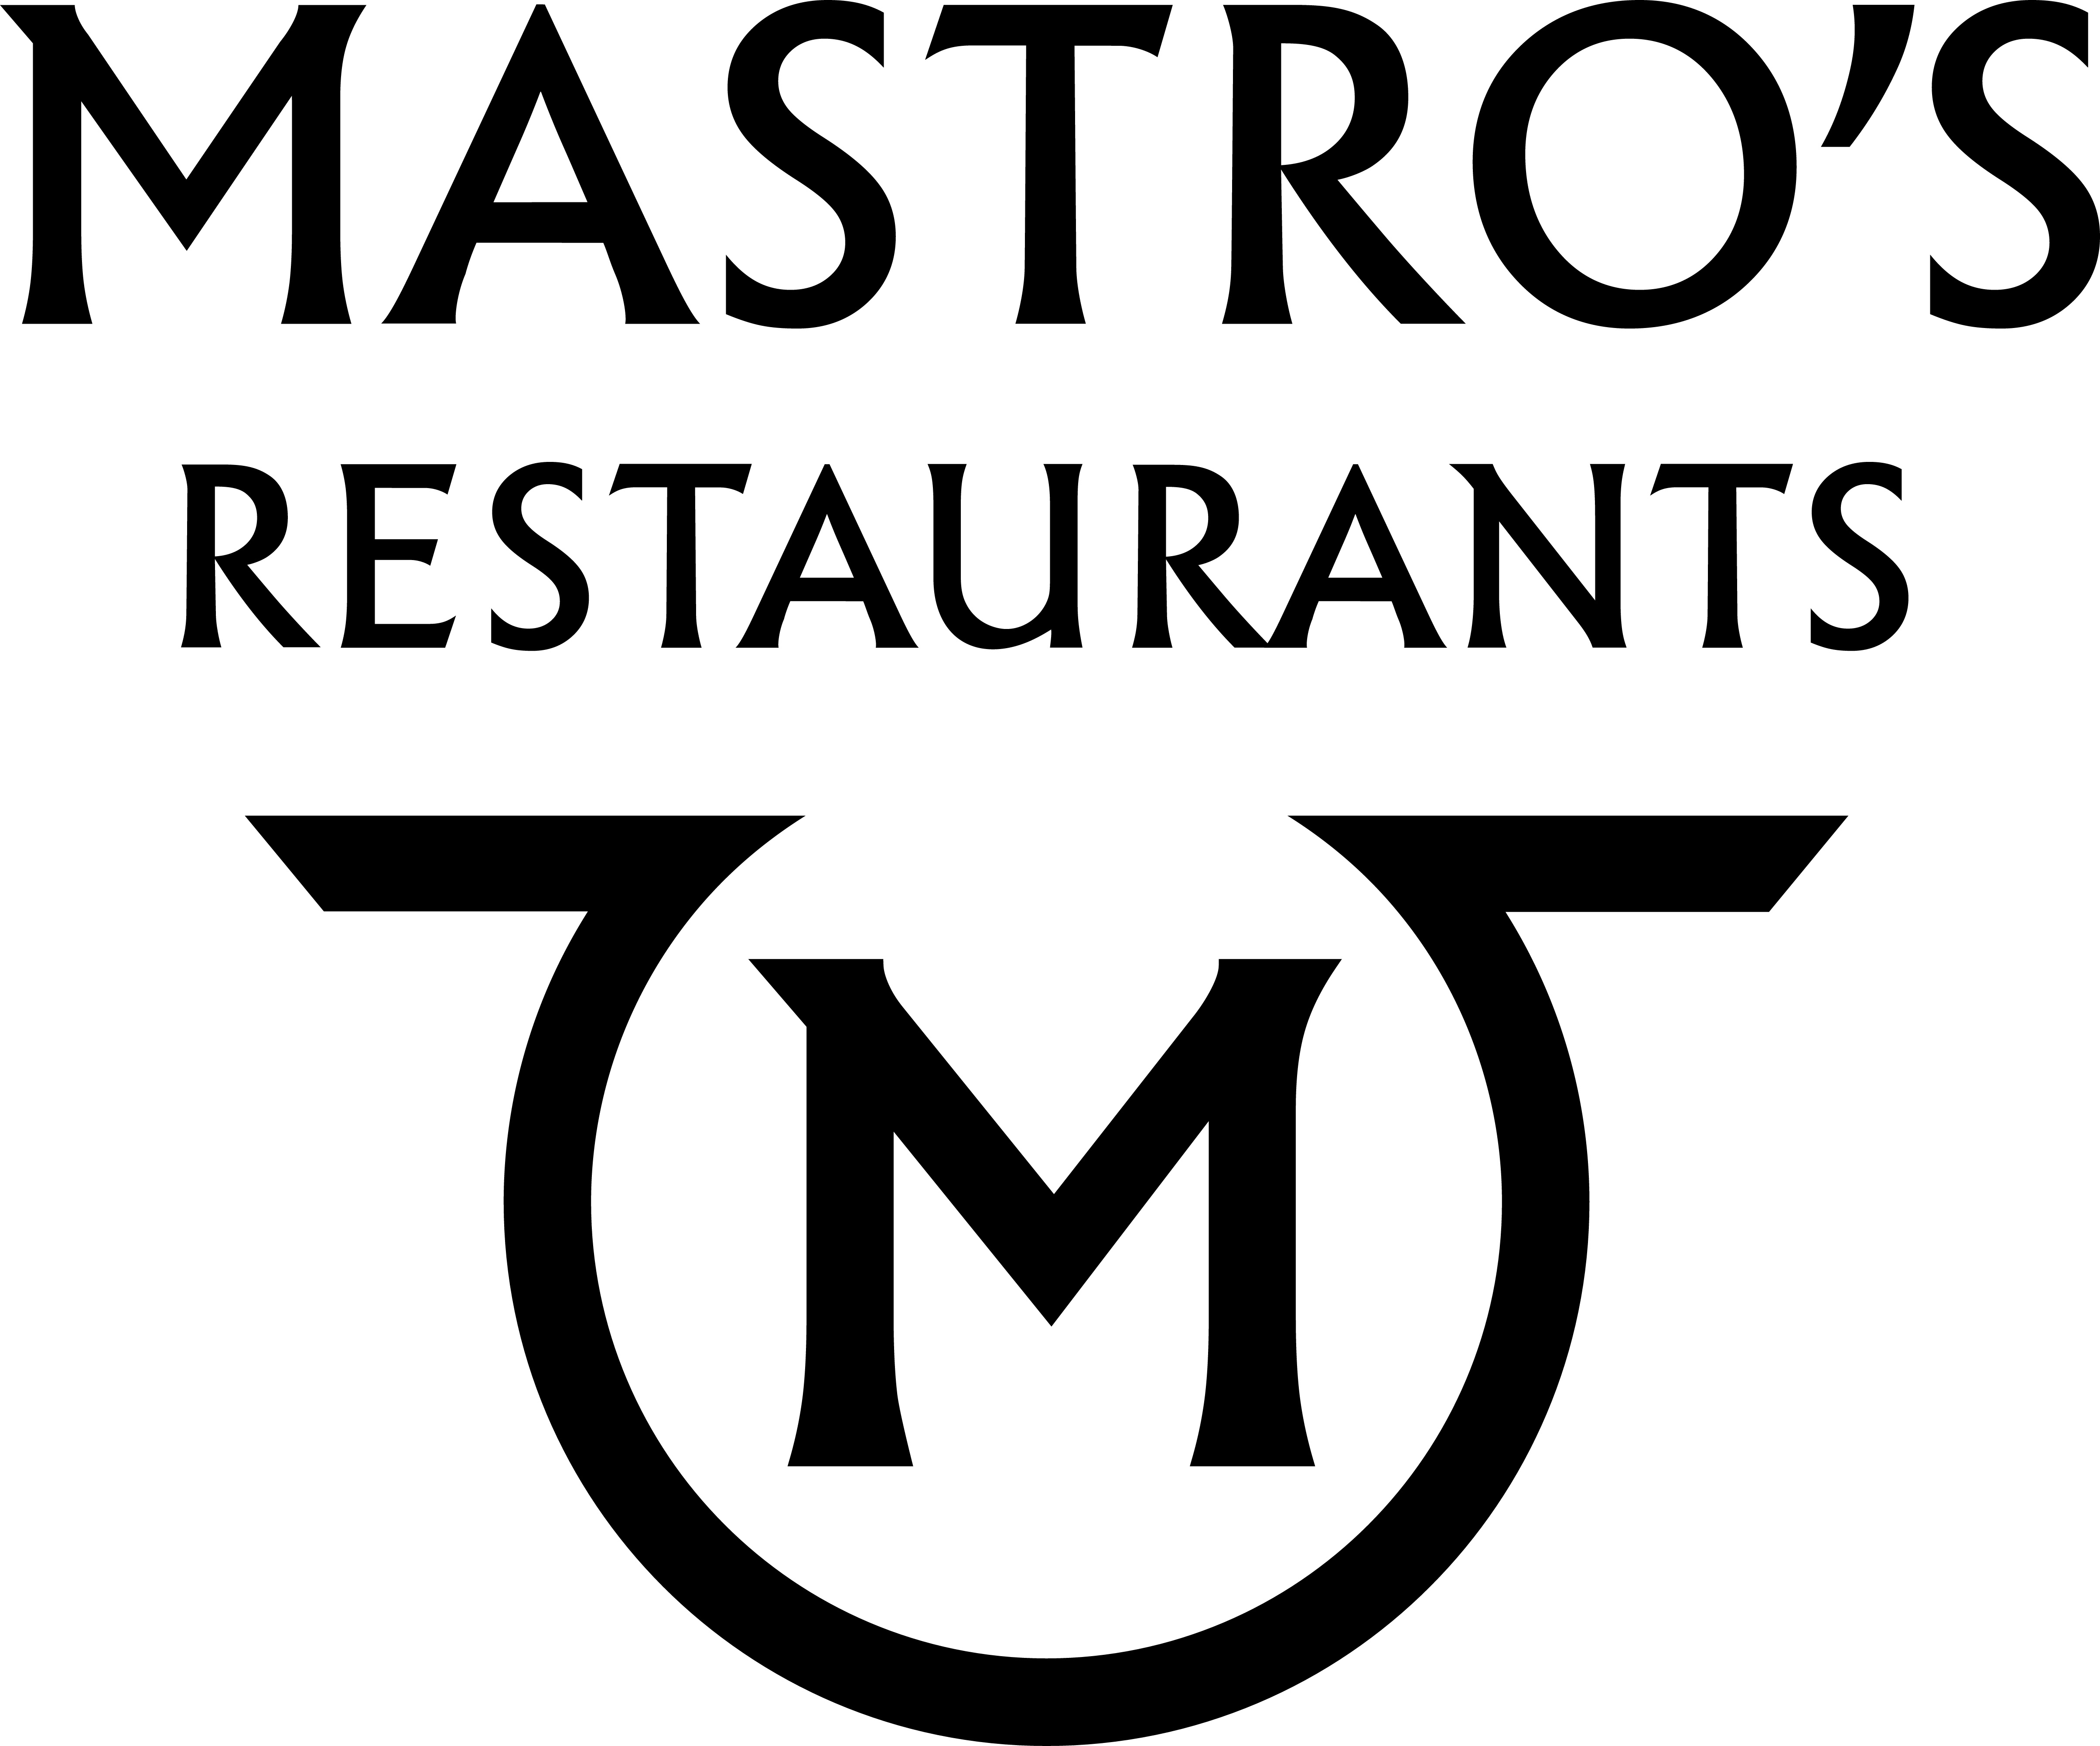 MastrosRRHighRes